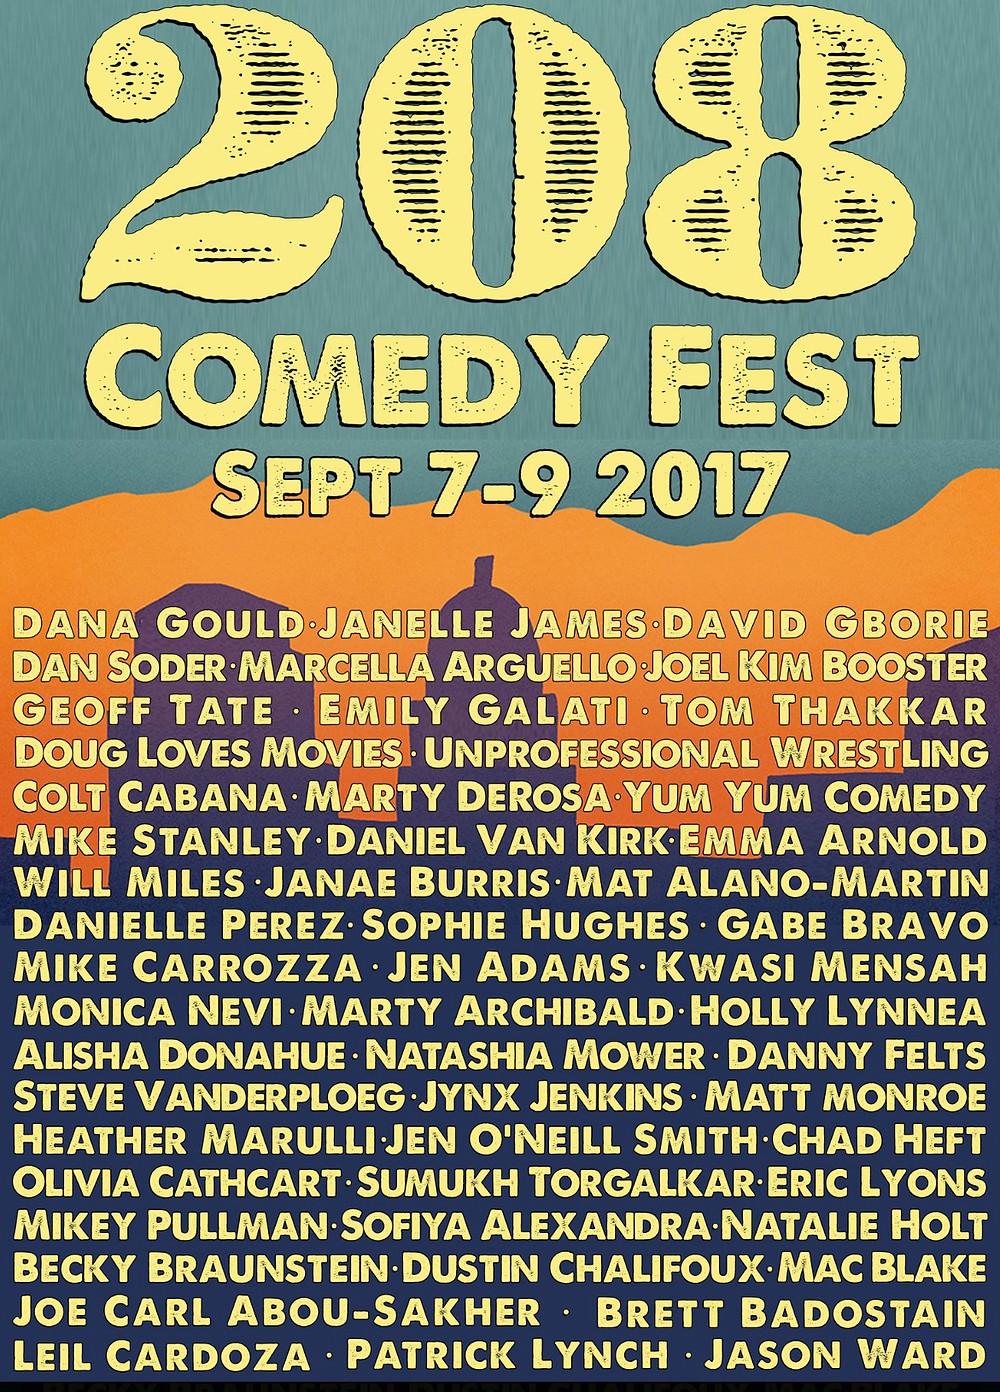 208 Comedy Festival Poster